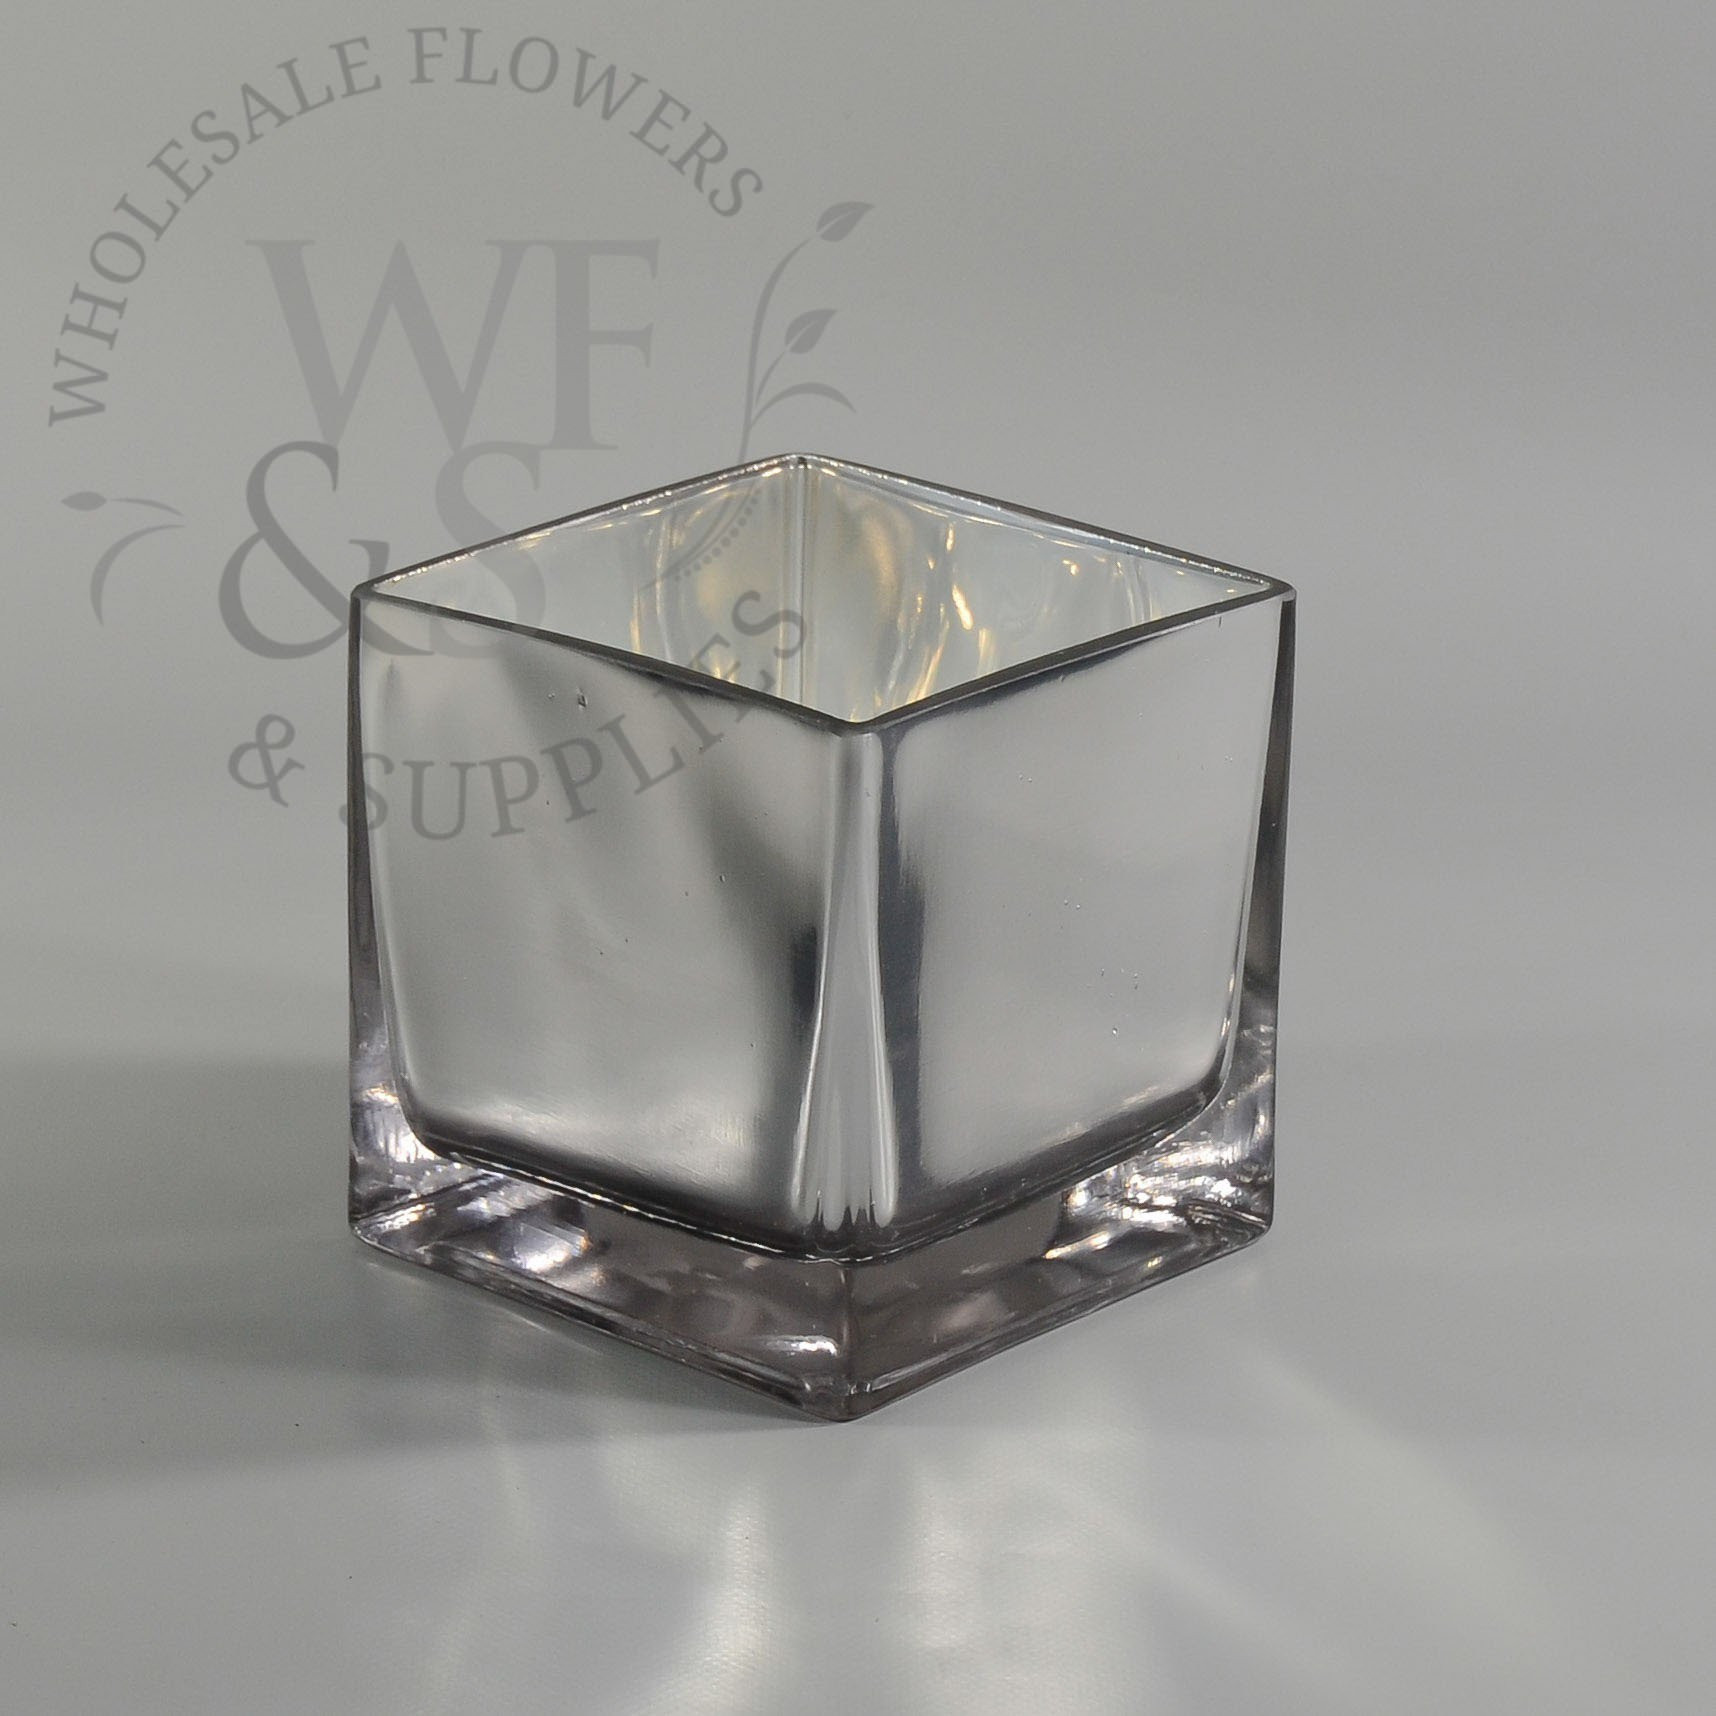 antique lenox vases of 13 fresh silver mirror vase bogekompresorturkiye com within crystal mirror inspirational mirror vase 8 1h vases mirrored square cube riser inch squarei 0d uk